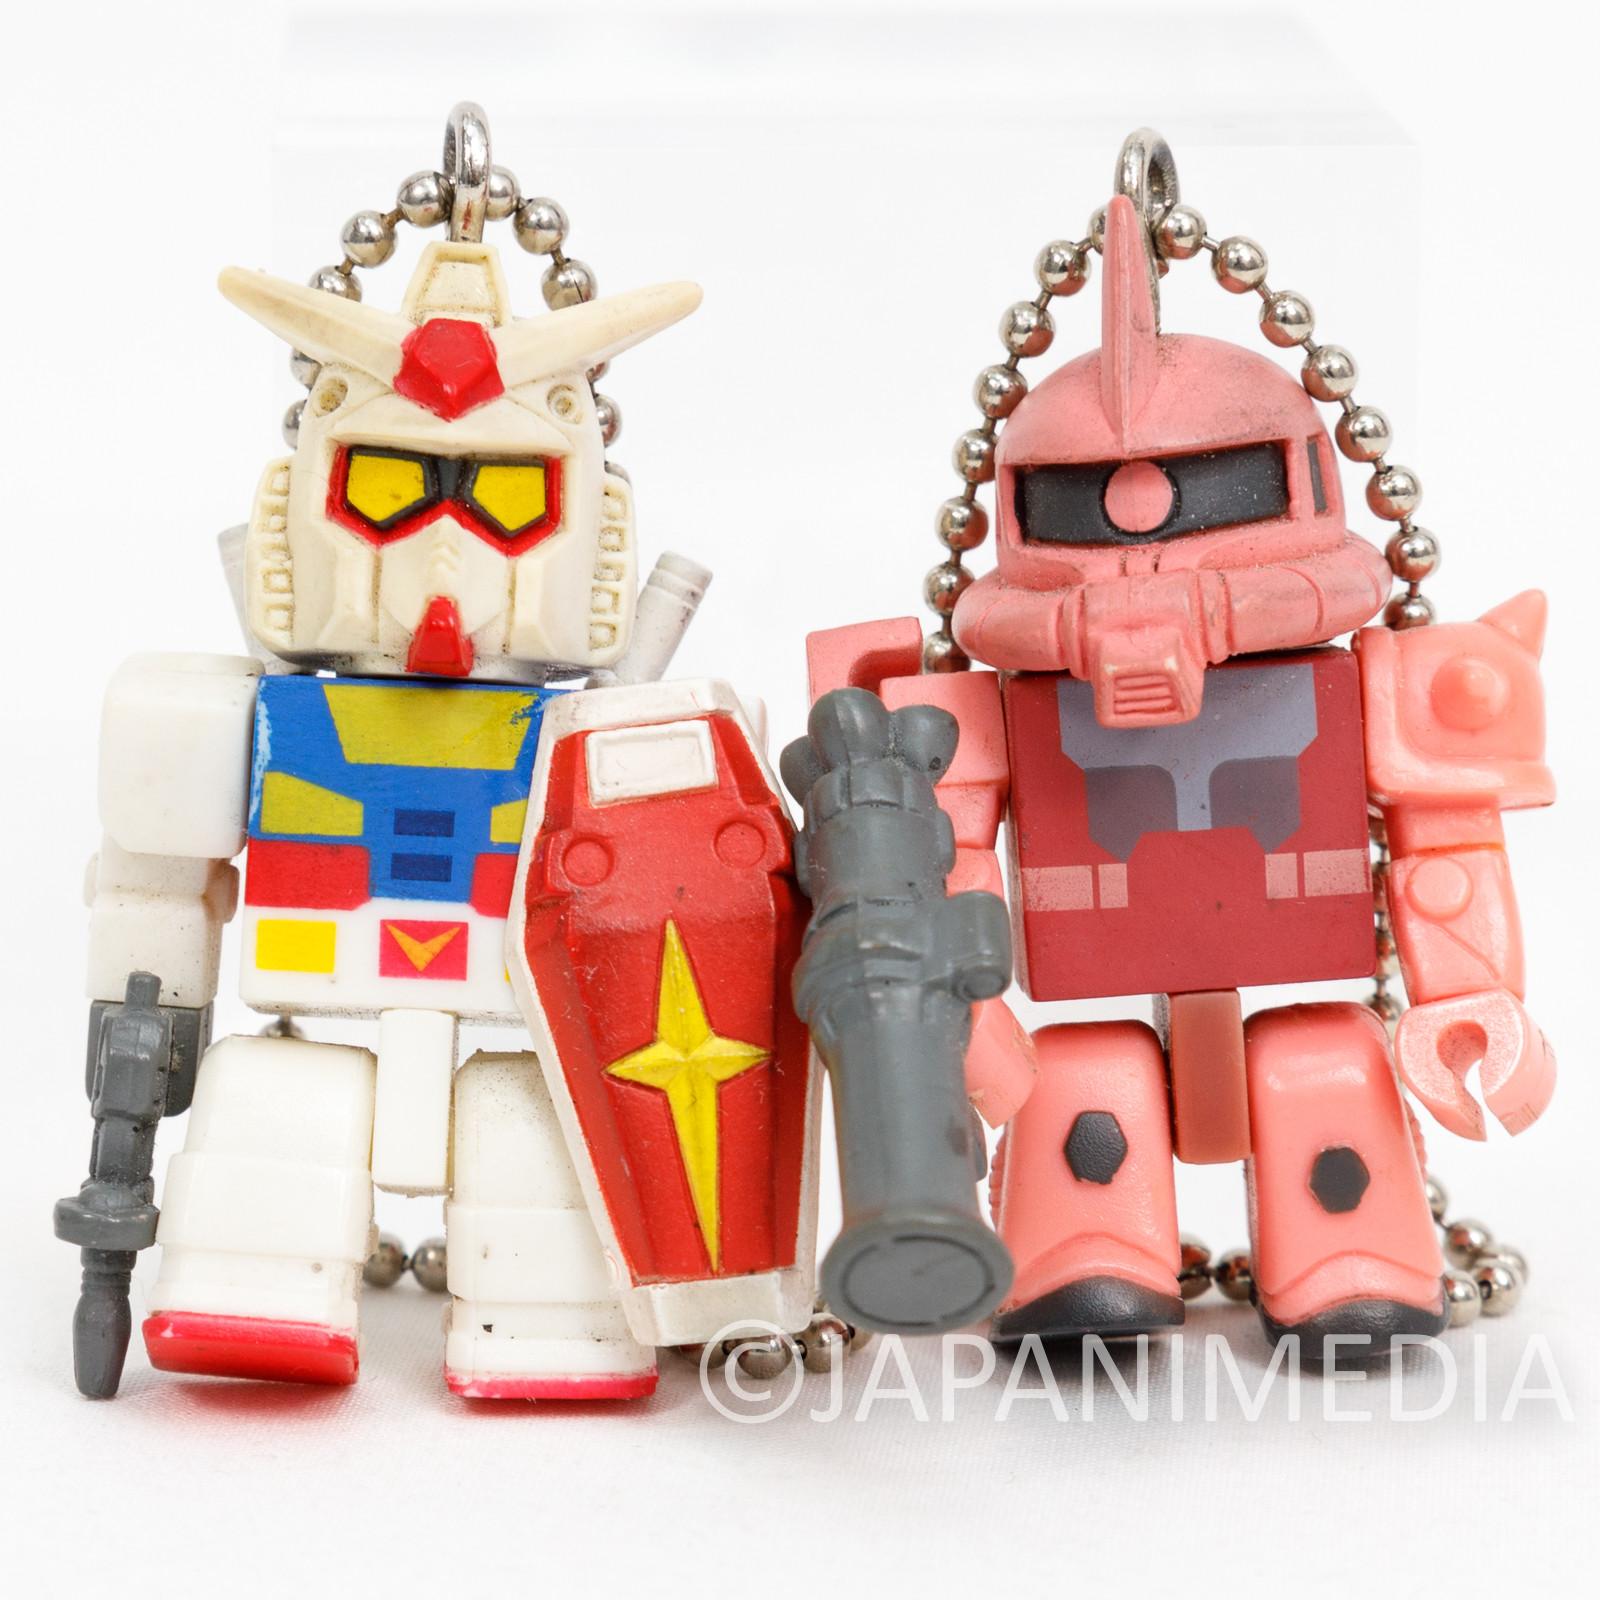 Mobile Suit Gundam RX-78 & MS-06S Char Red Zaku Figure Ballchain Set